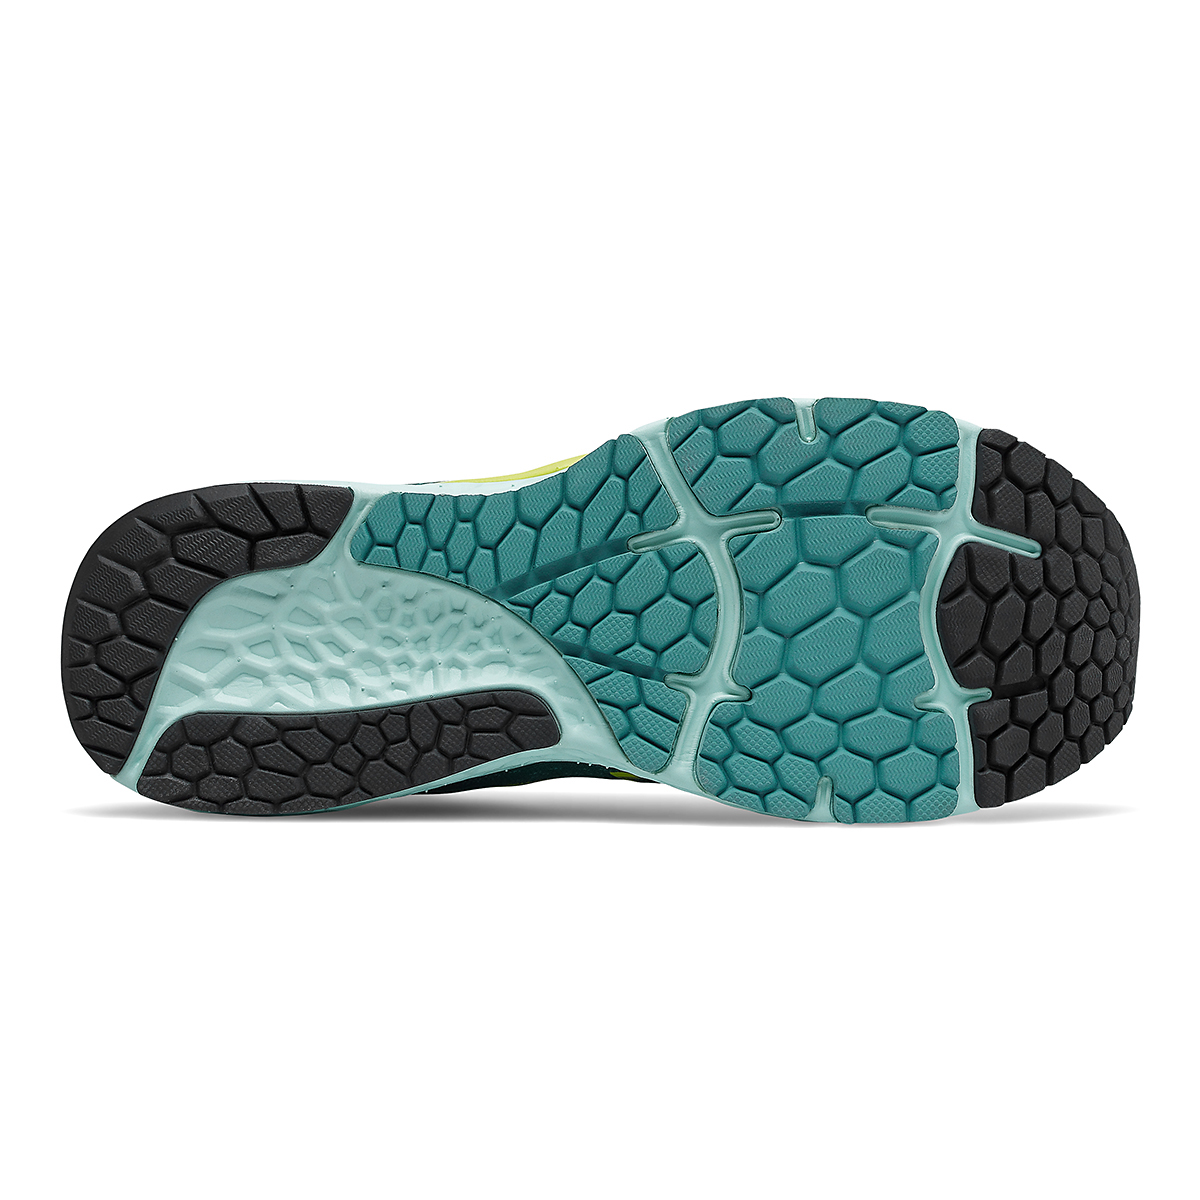 Men's New Balance Fresh Foam 880v11 Running Shoe - Color: Trek/Sulpher Yellow - Size: 7 - Width: Wide, Trek/Sulpher Yellow, large, image 5